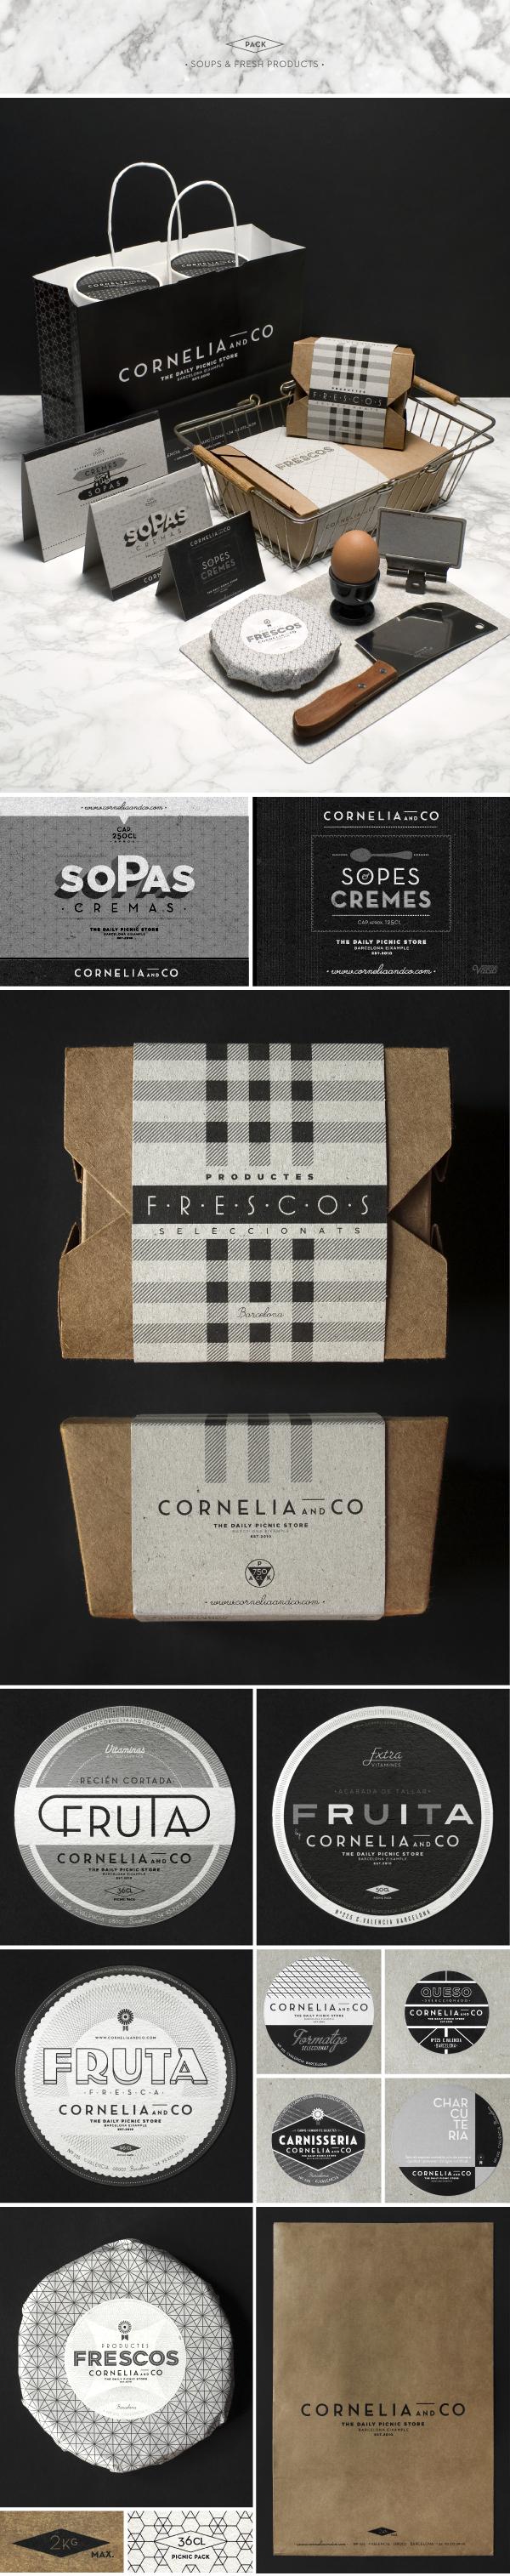 cornelia&co restaurant take away barcelona picnic Food  market backery Kraft Pack winery Coffee